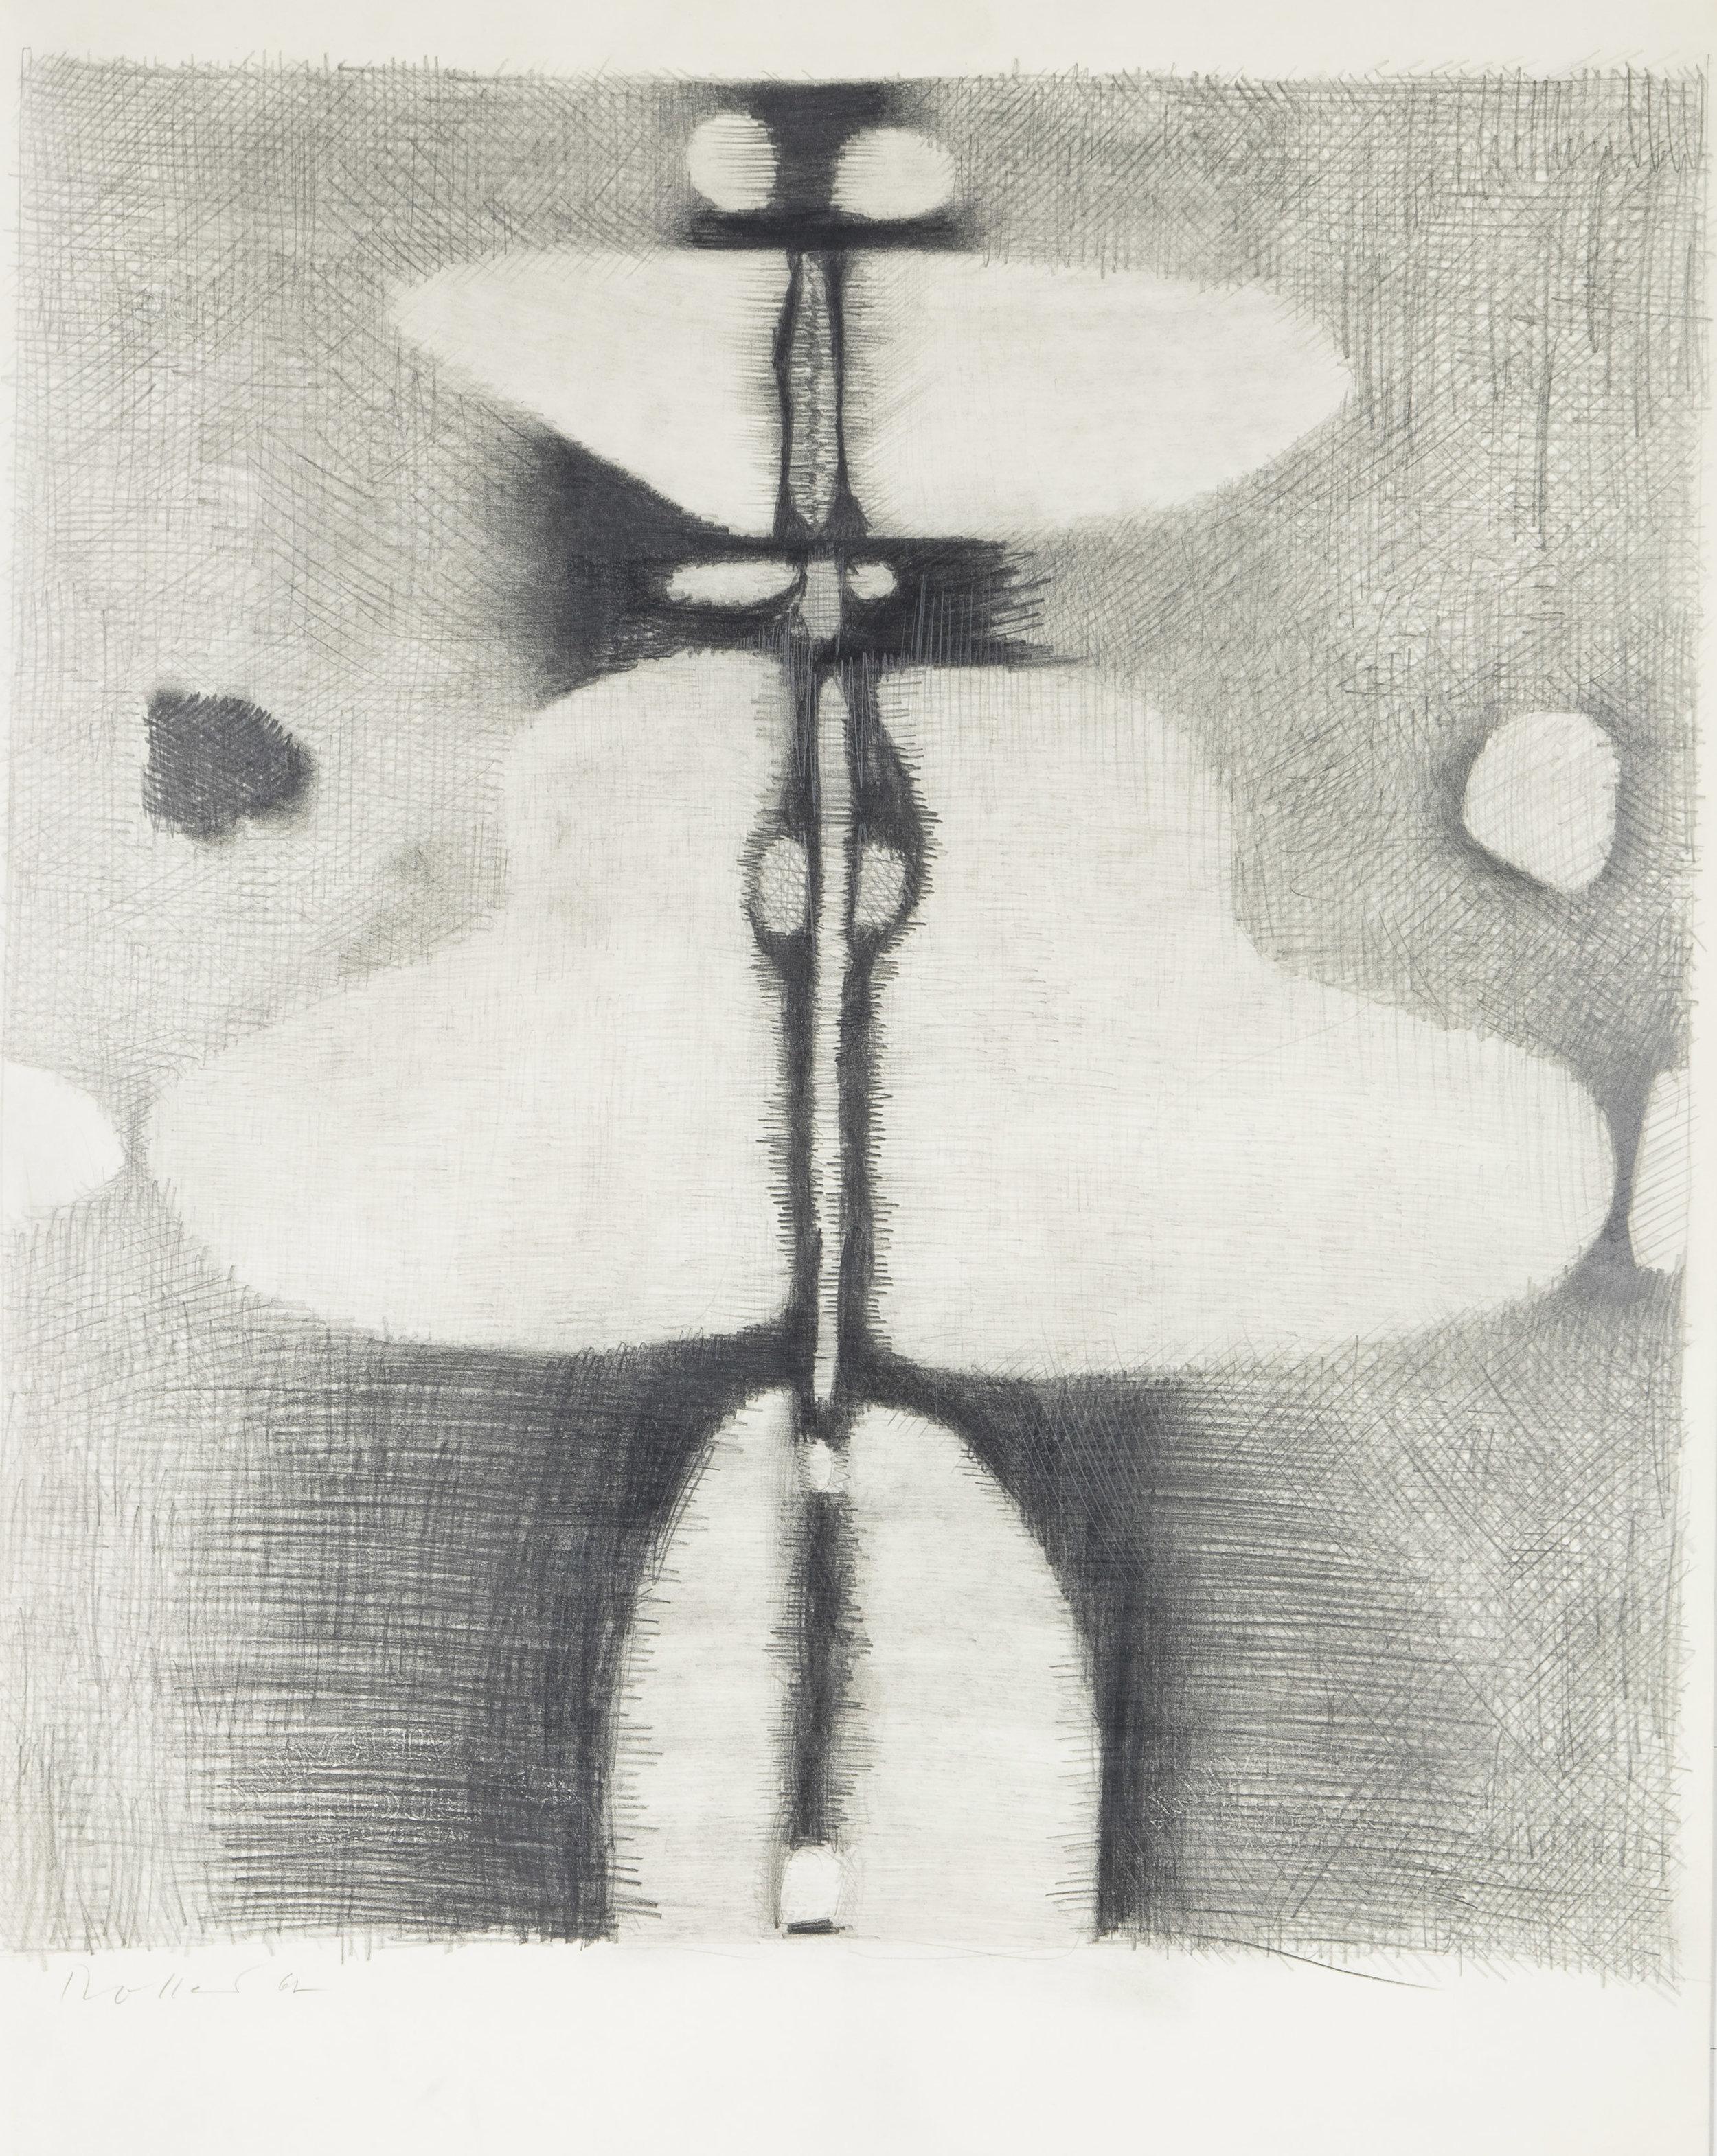 Troller-Untitled1962-153.jpg